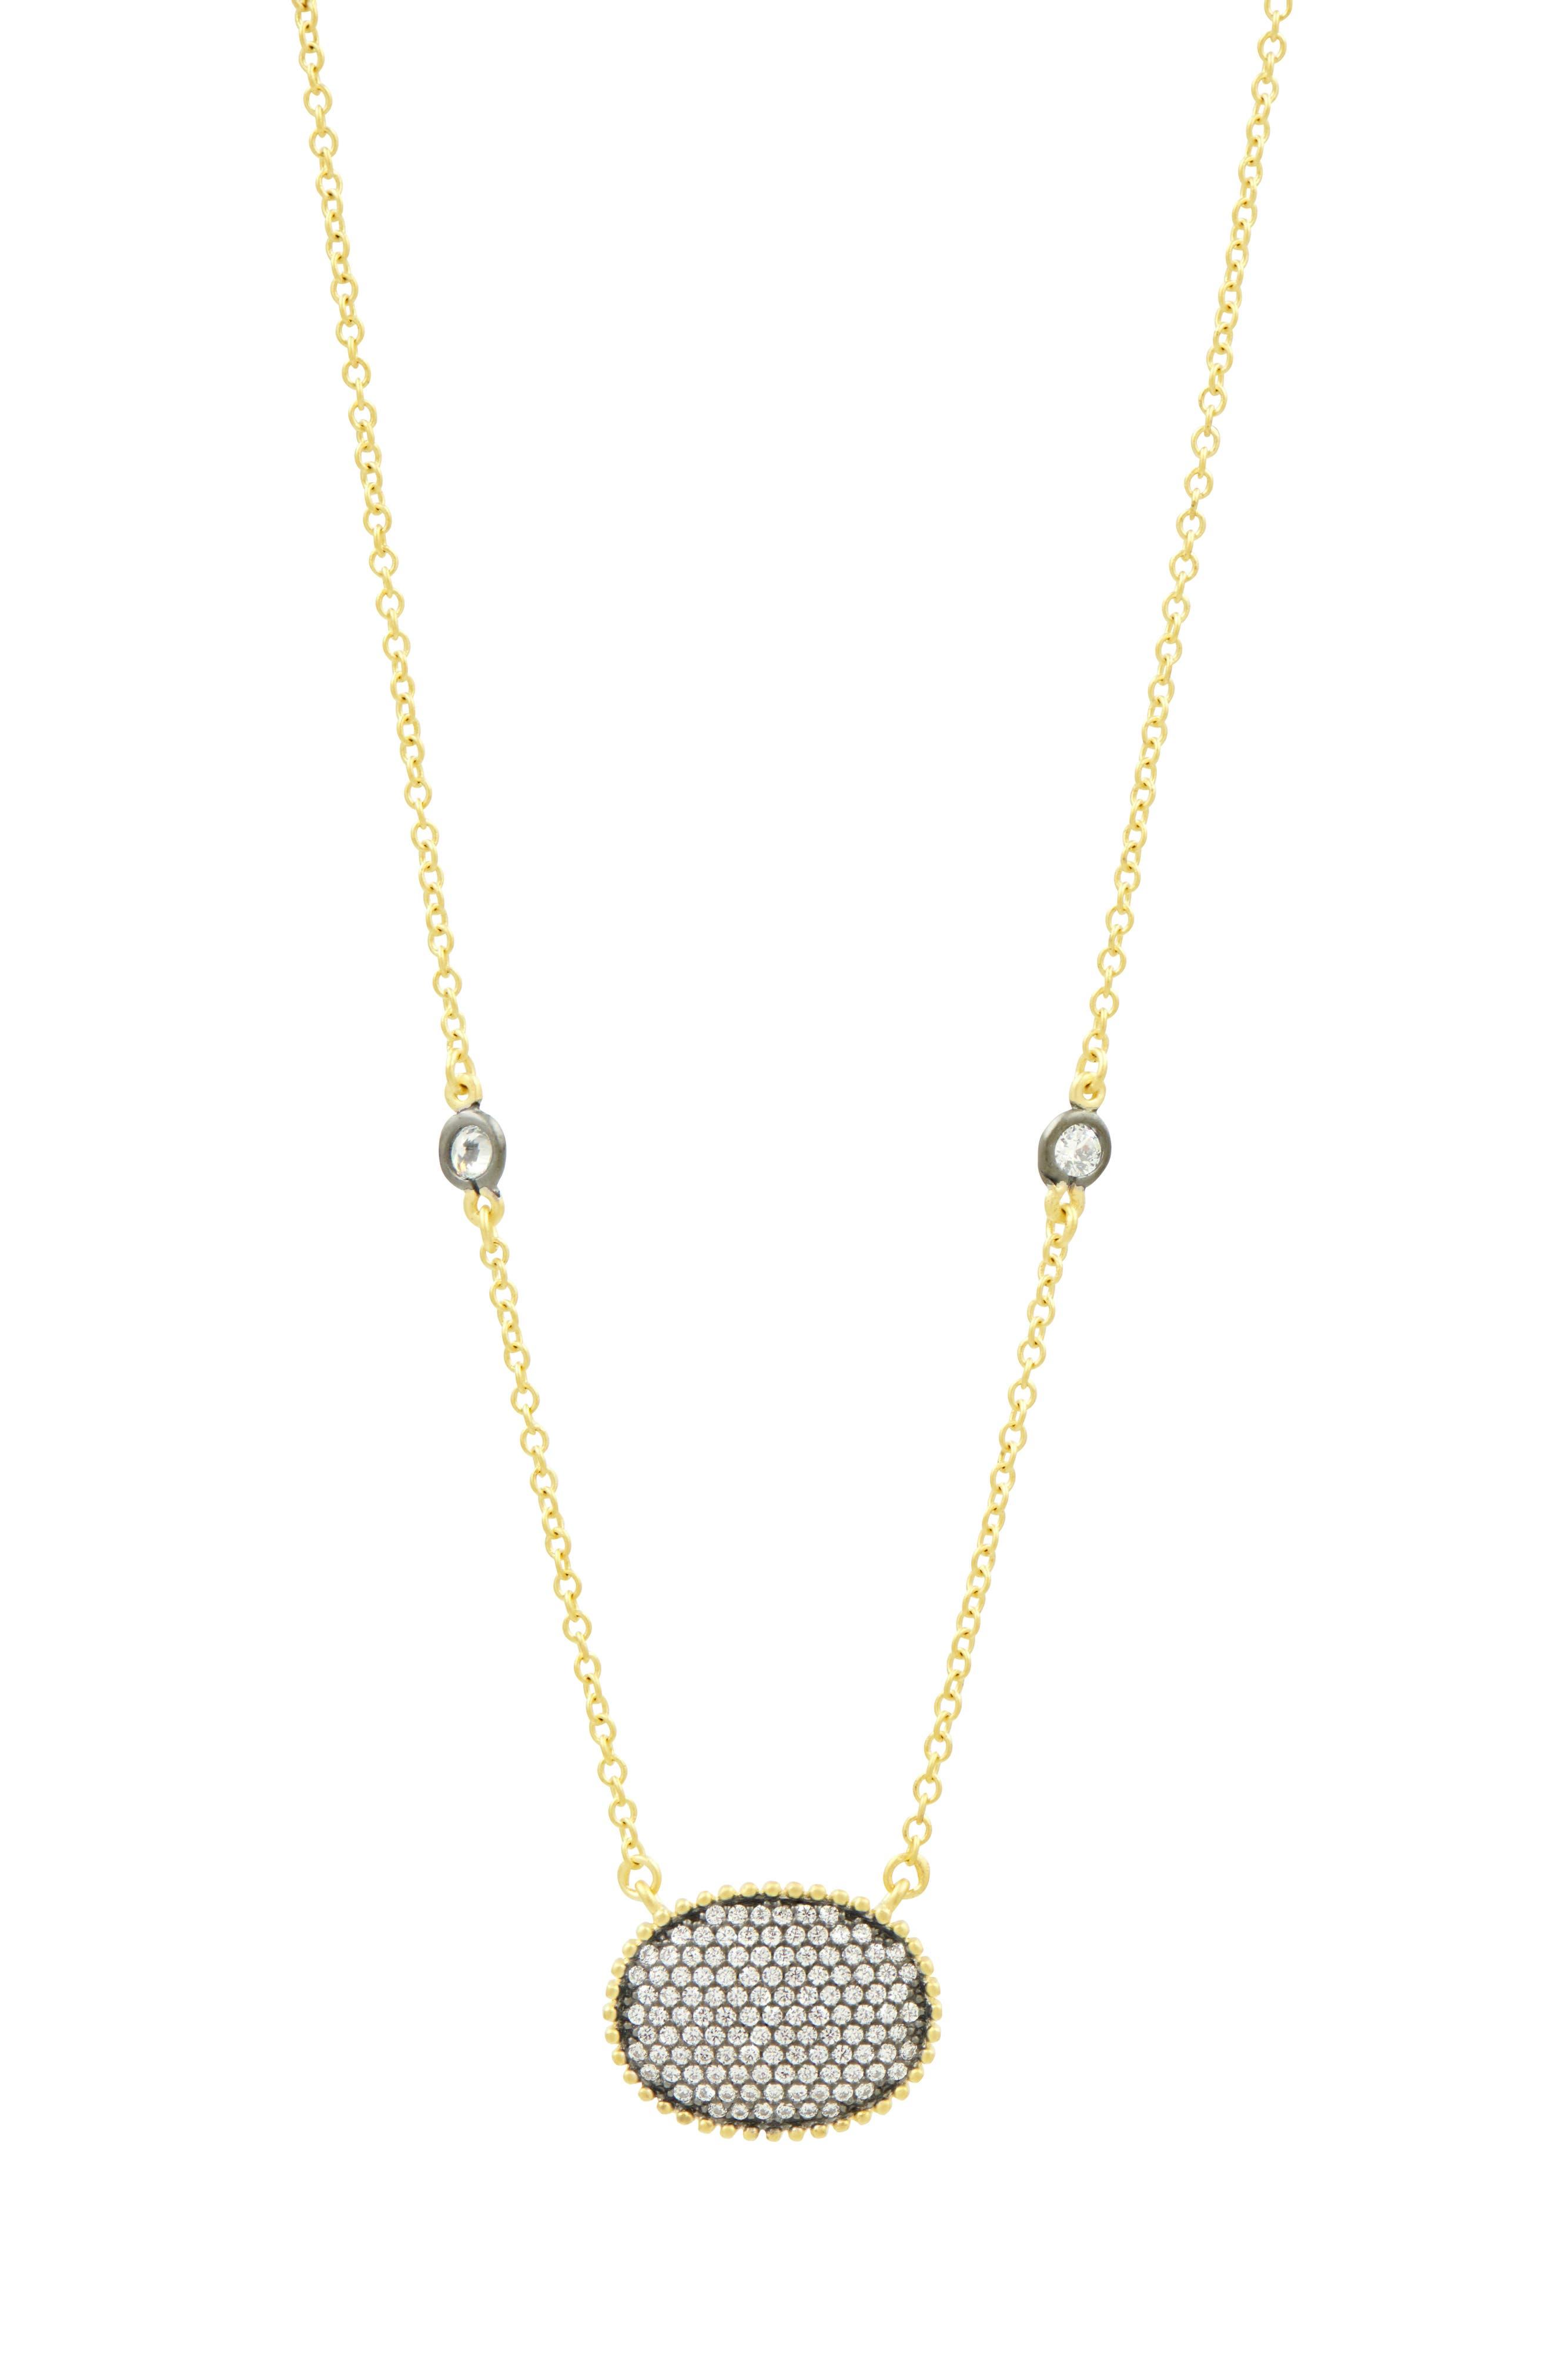 Oval Pendant Necklace,                             Alternate thumbnail 2, color,                             Gold/ Black Rhodium